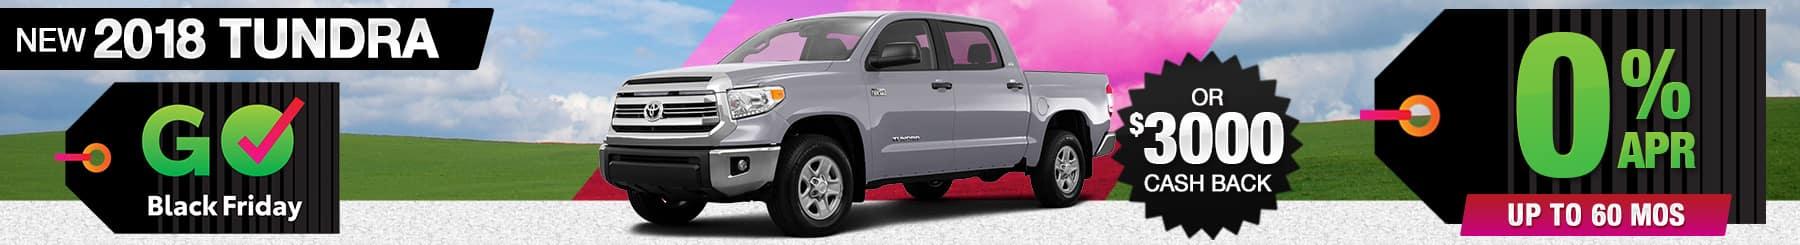 Toyota-Tundra-APR-Cash Back-Special